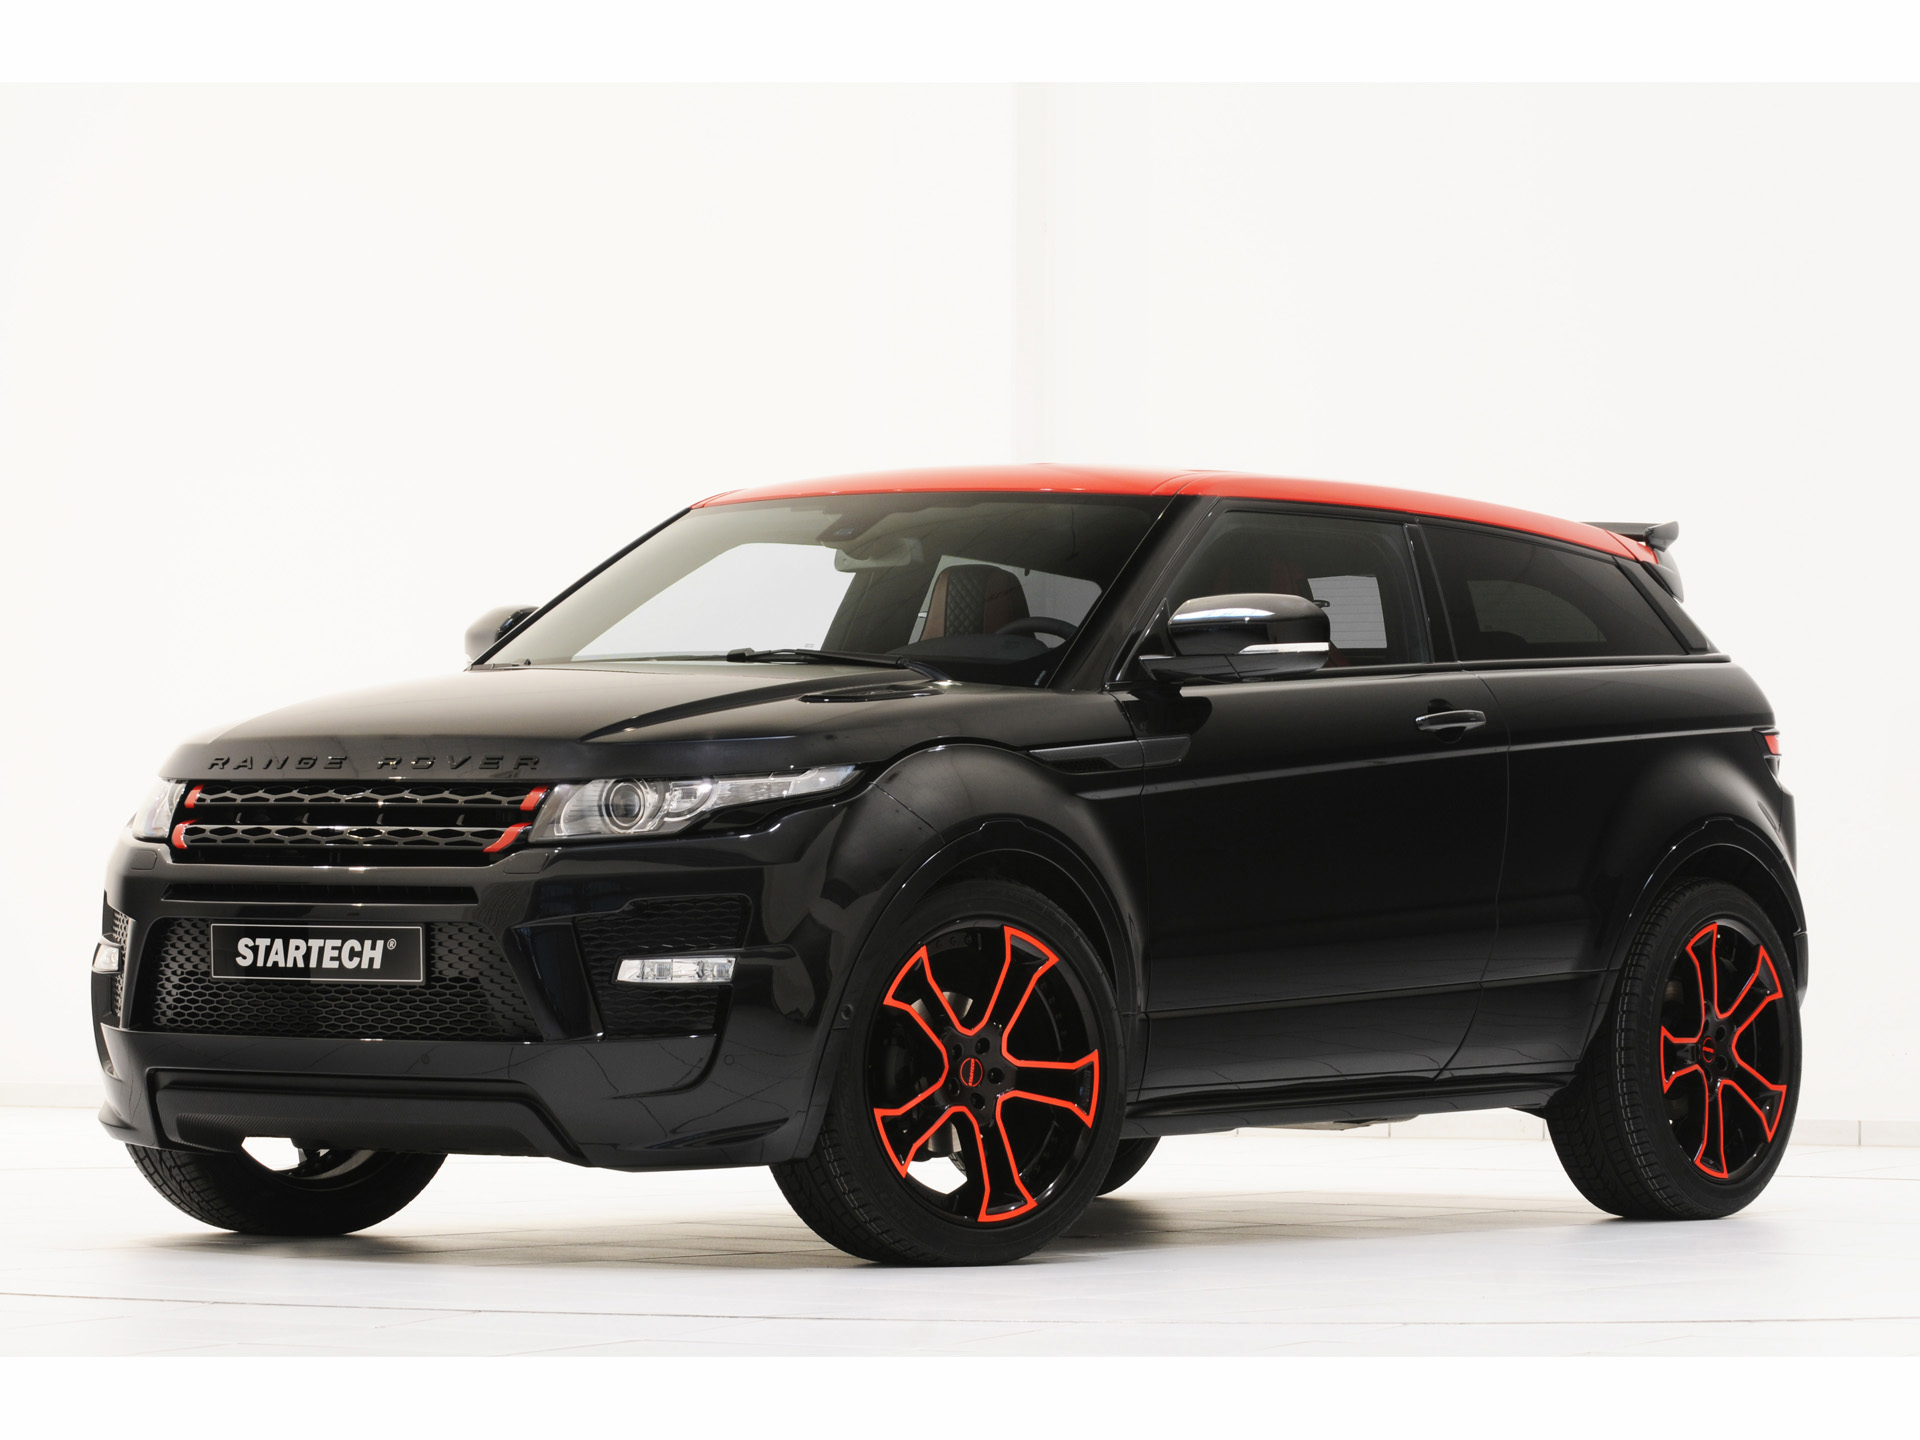 2012 Startech Range Rover Evoque News And Information